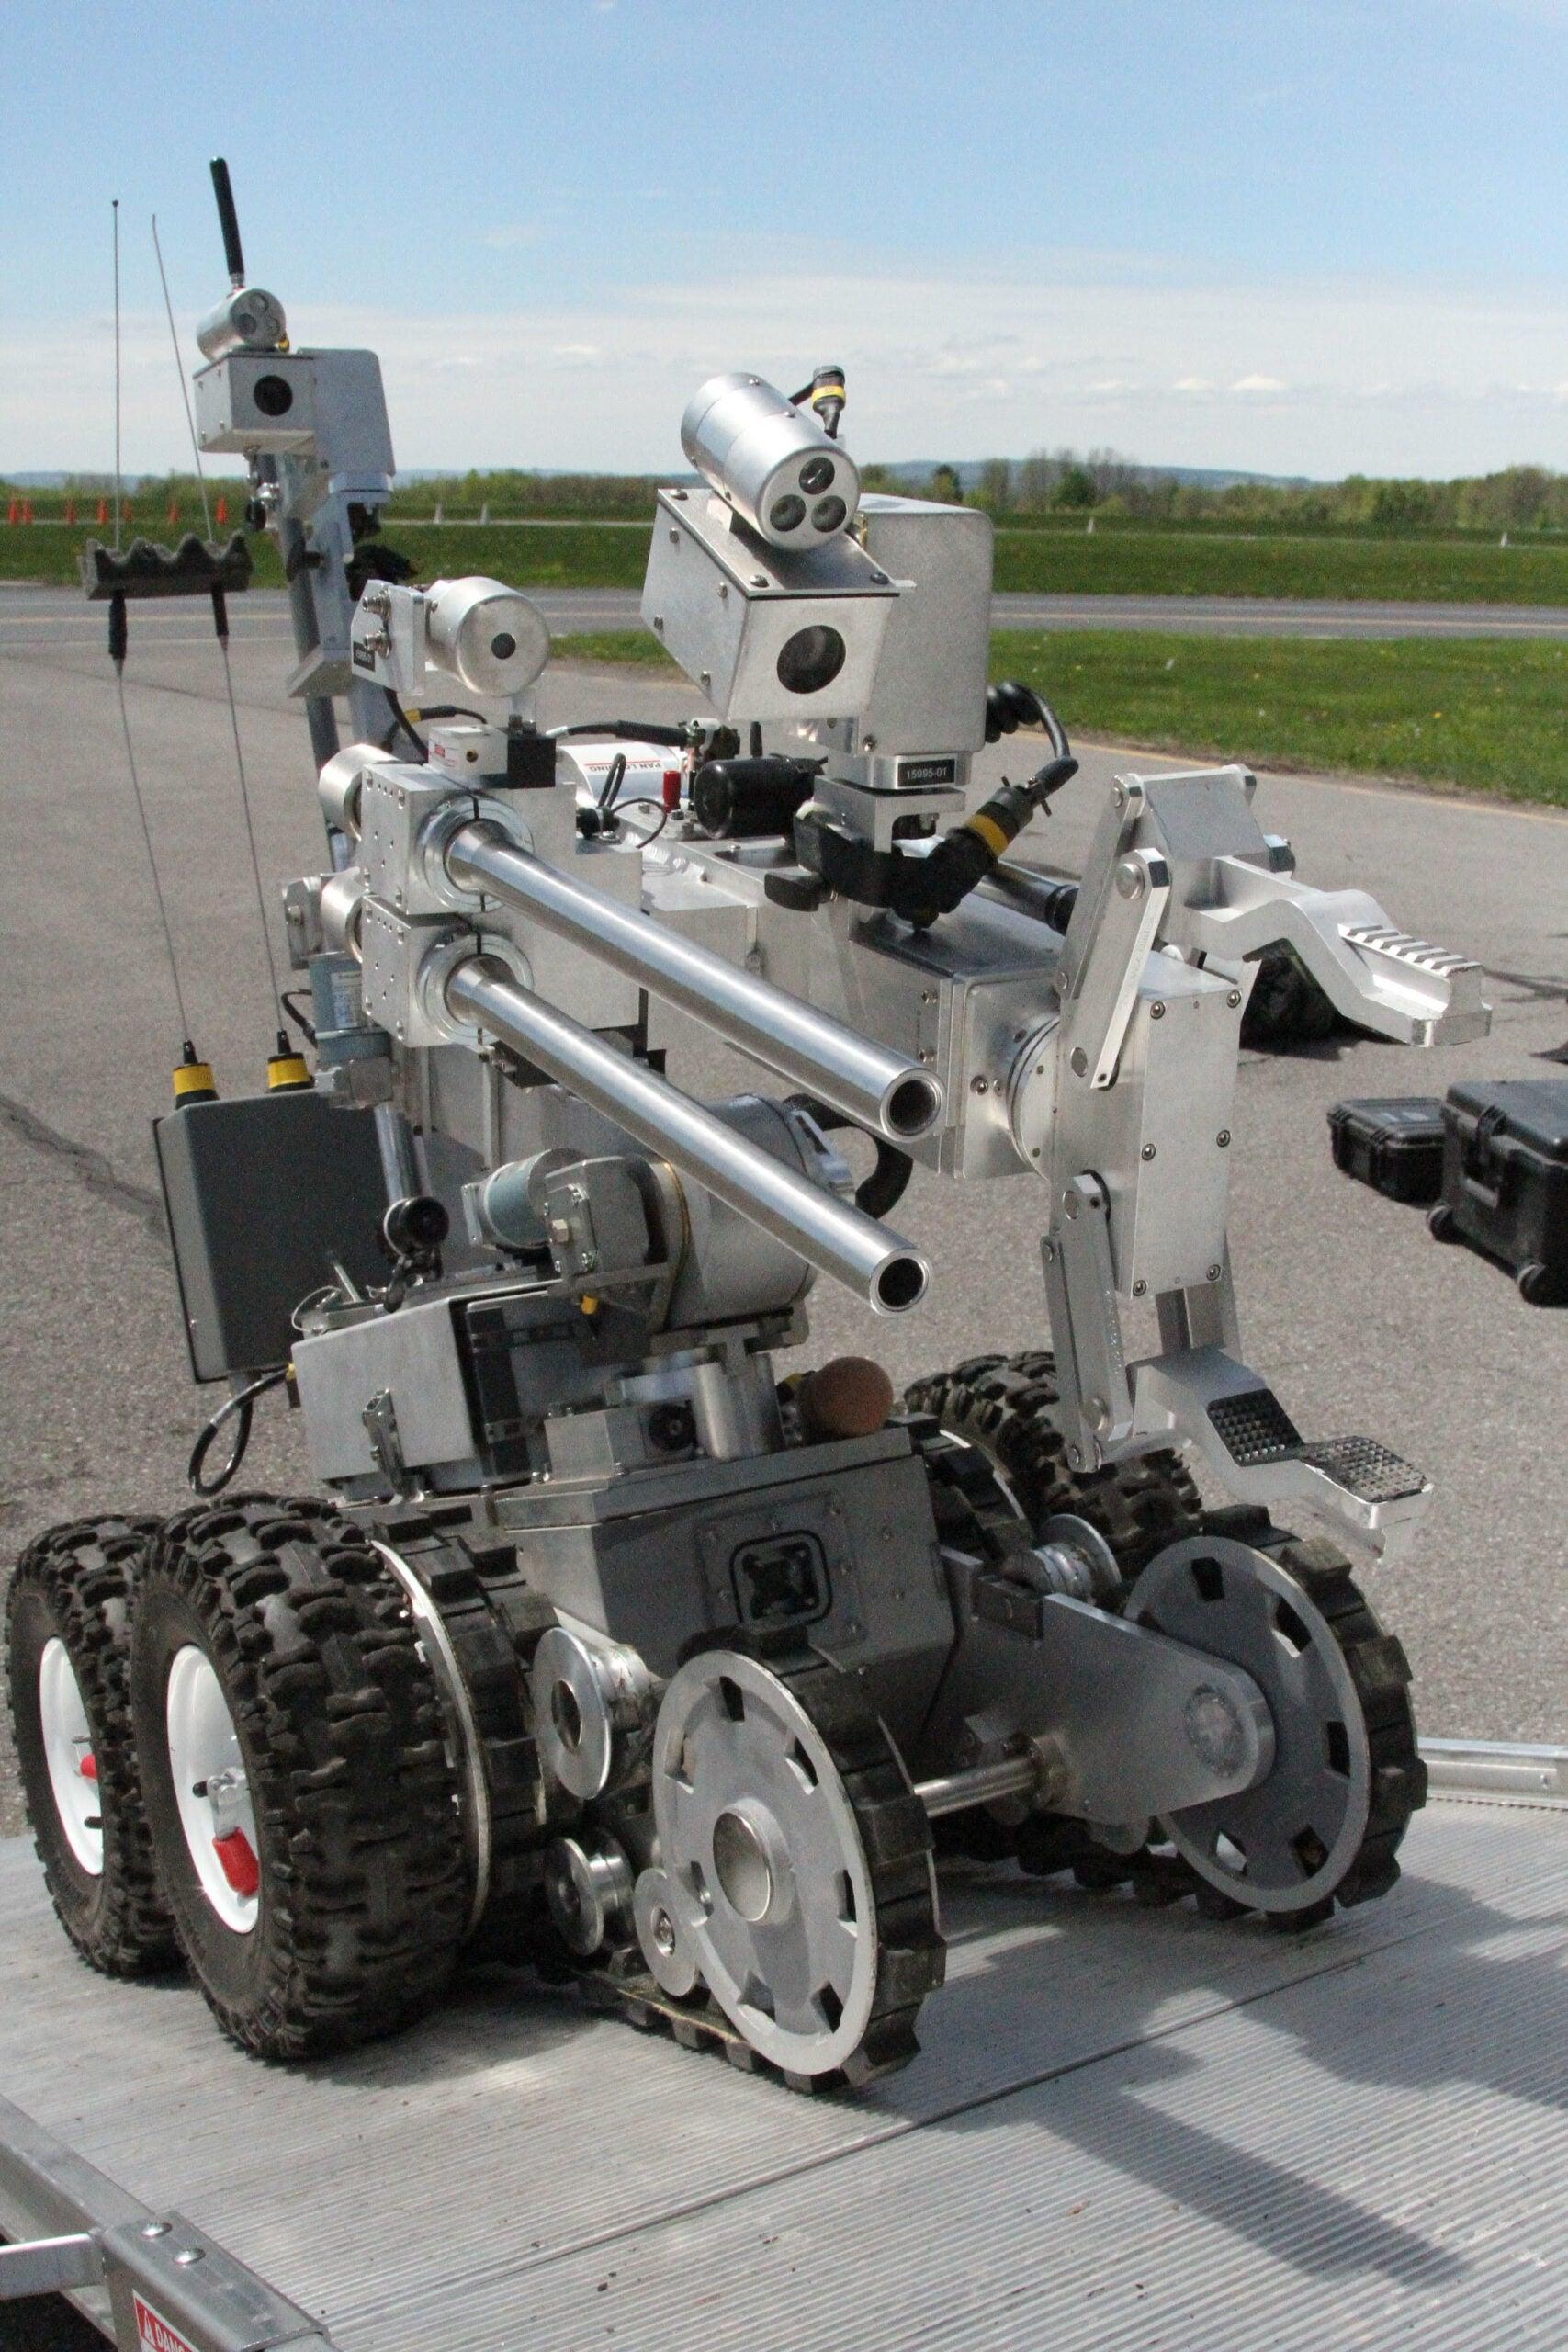 Bomb Squad Robot Drives Up Ramp